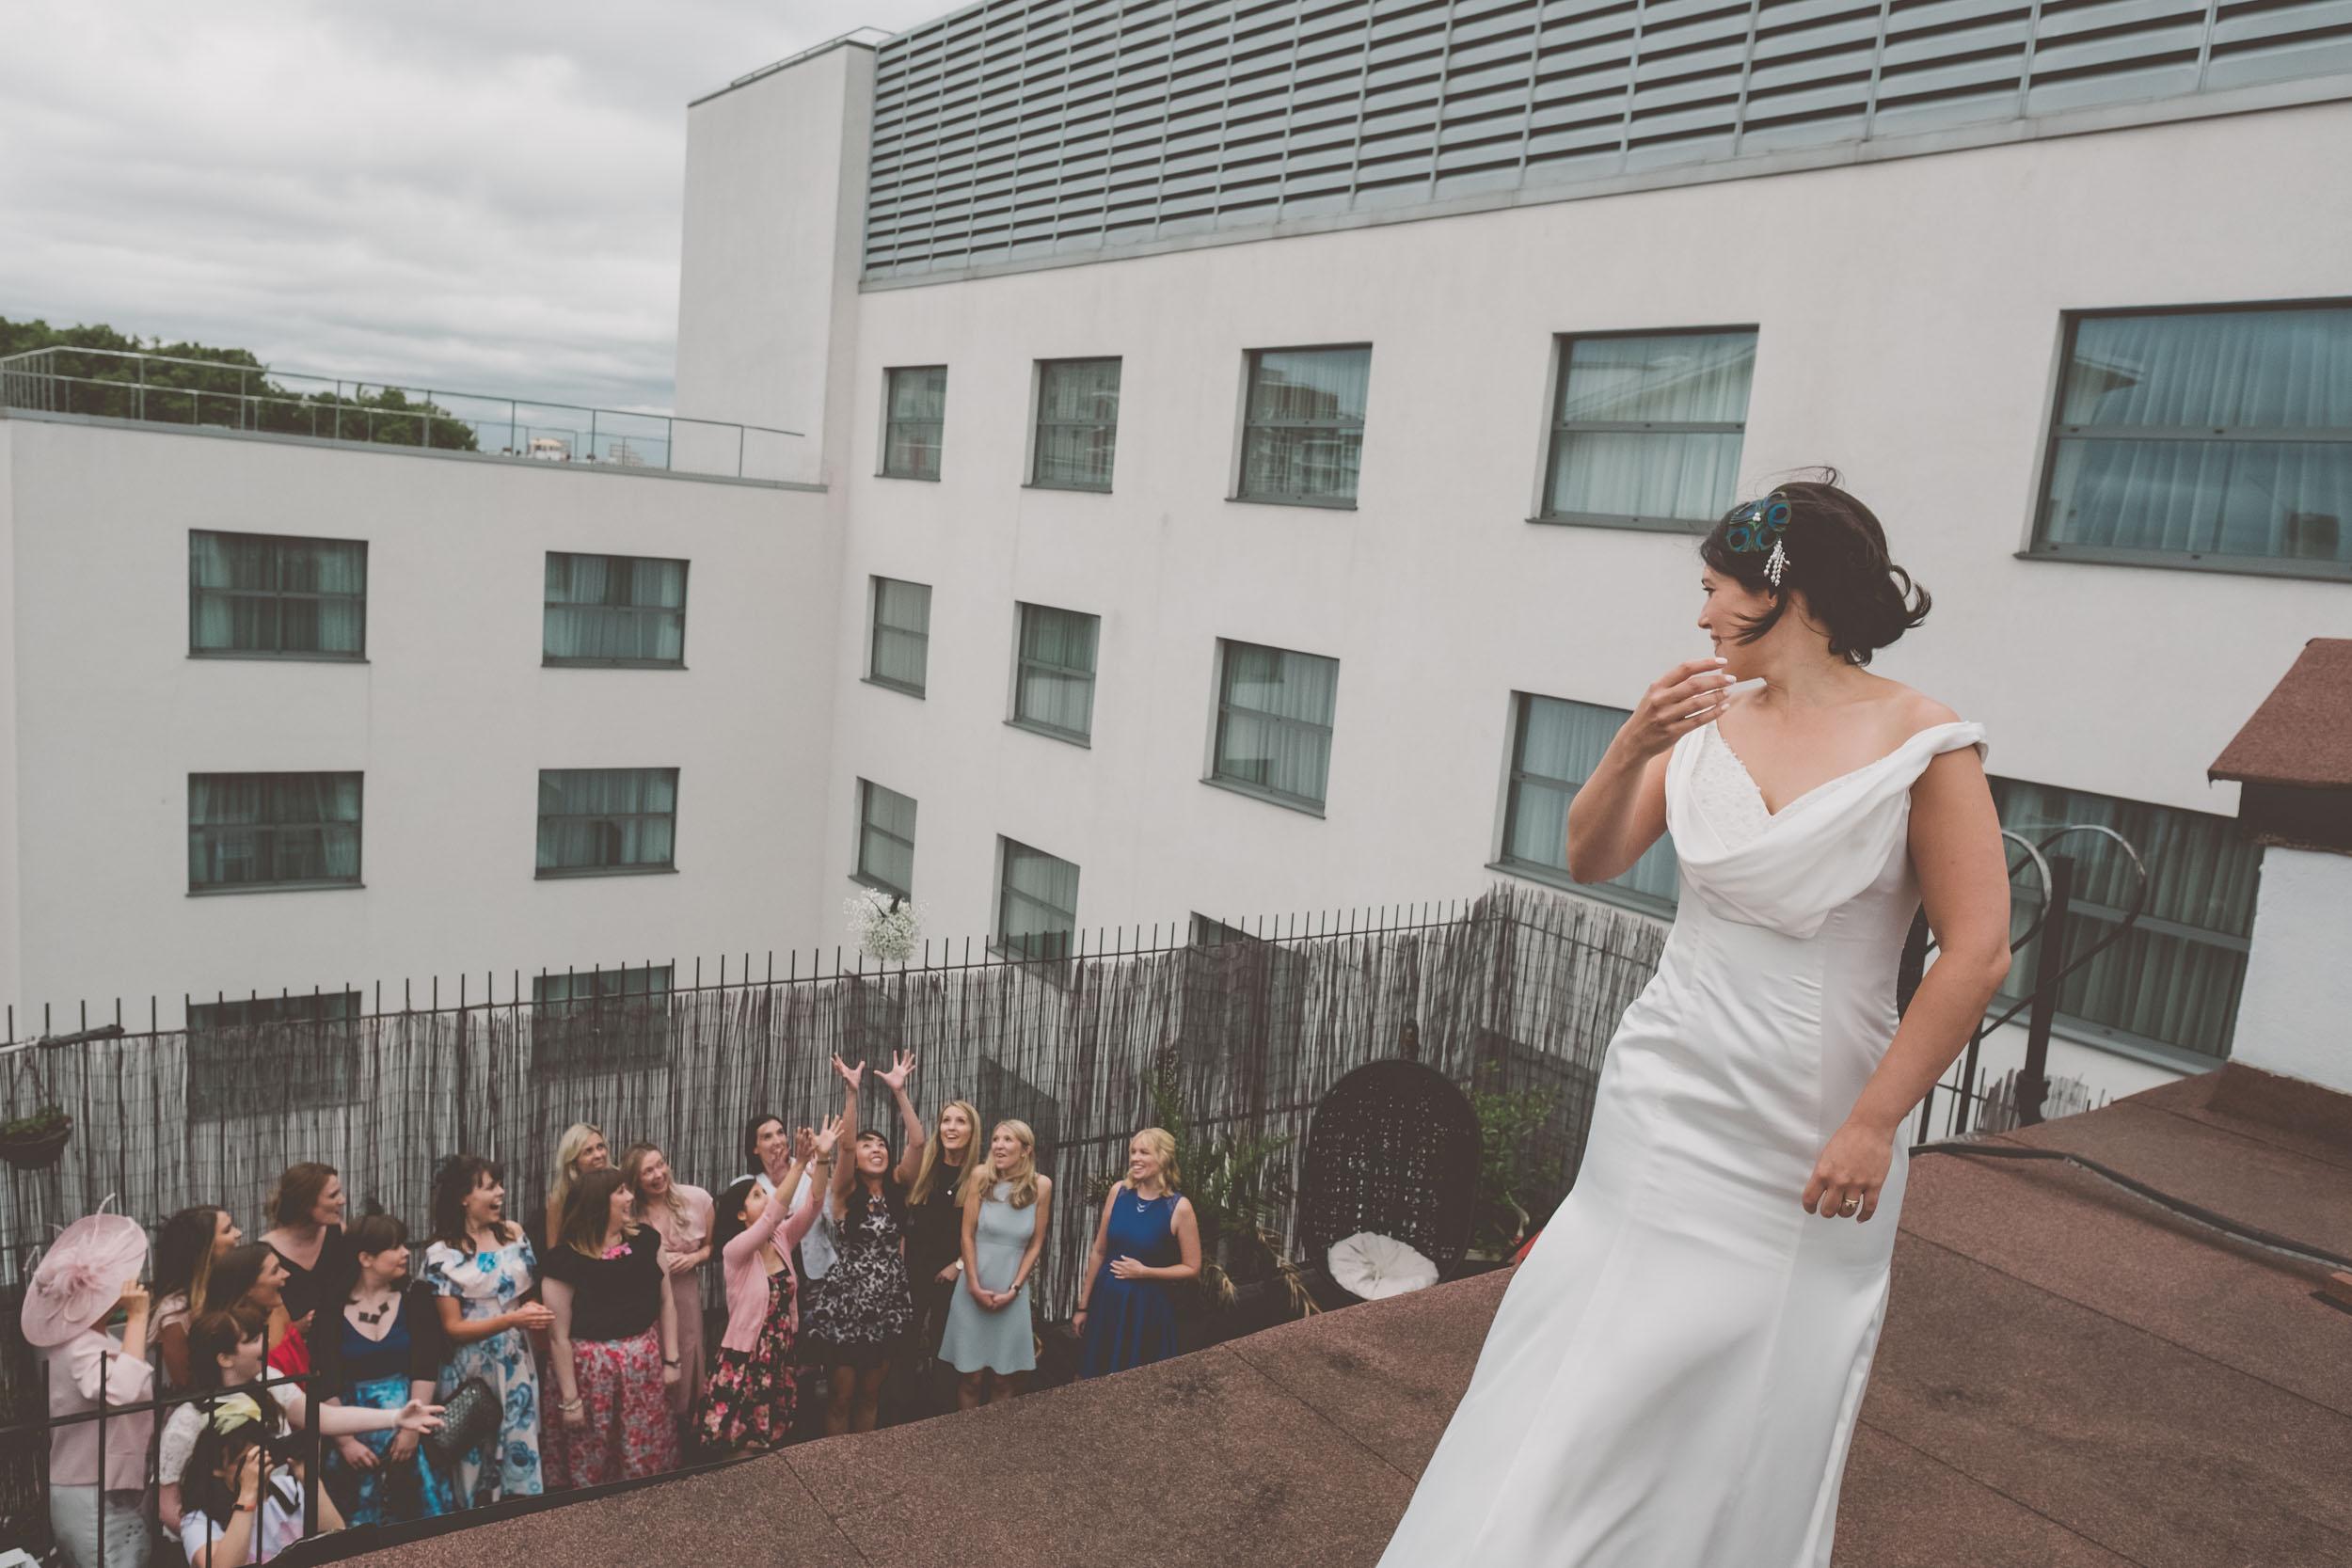 islington-town-hall-4th-floor-studios-wedding272.jpg